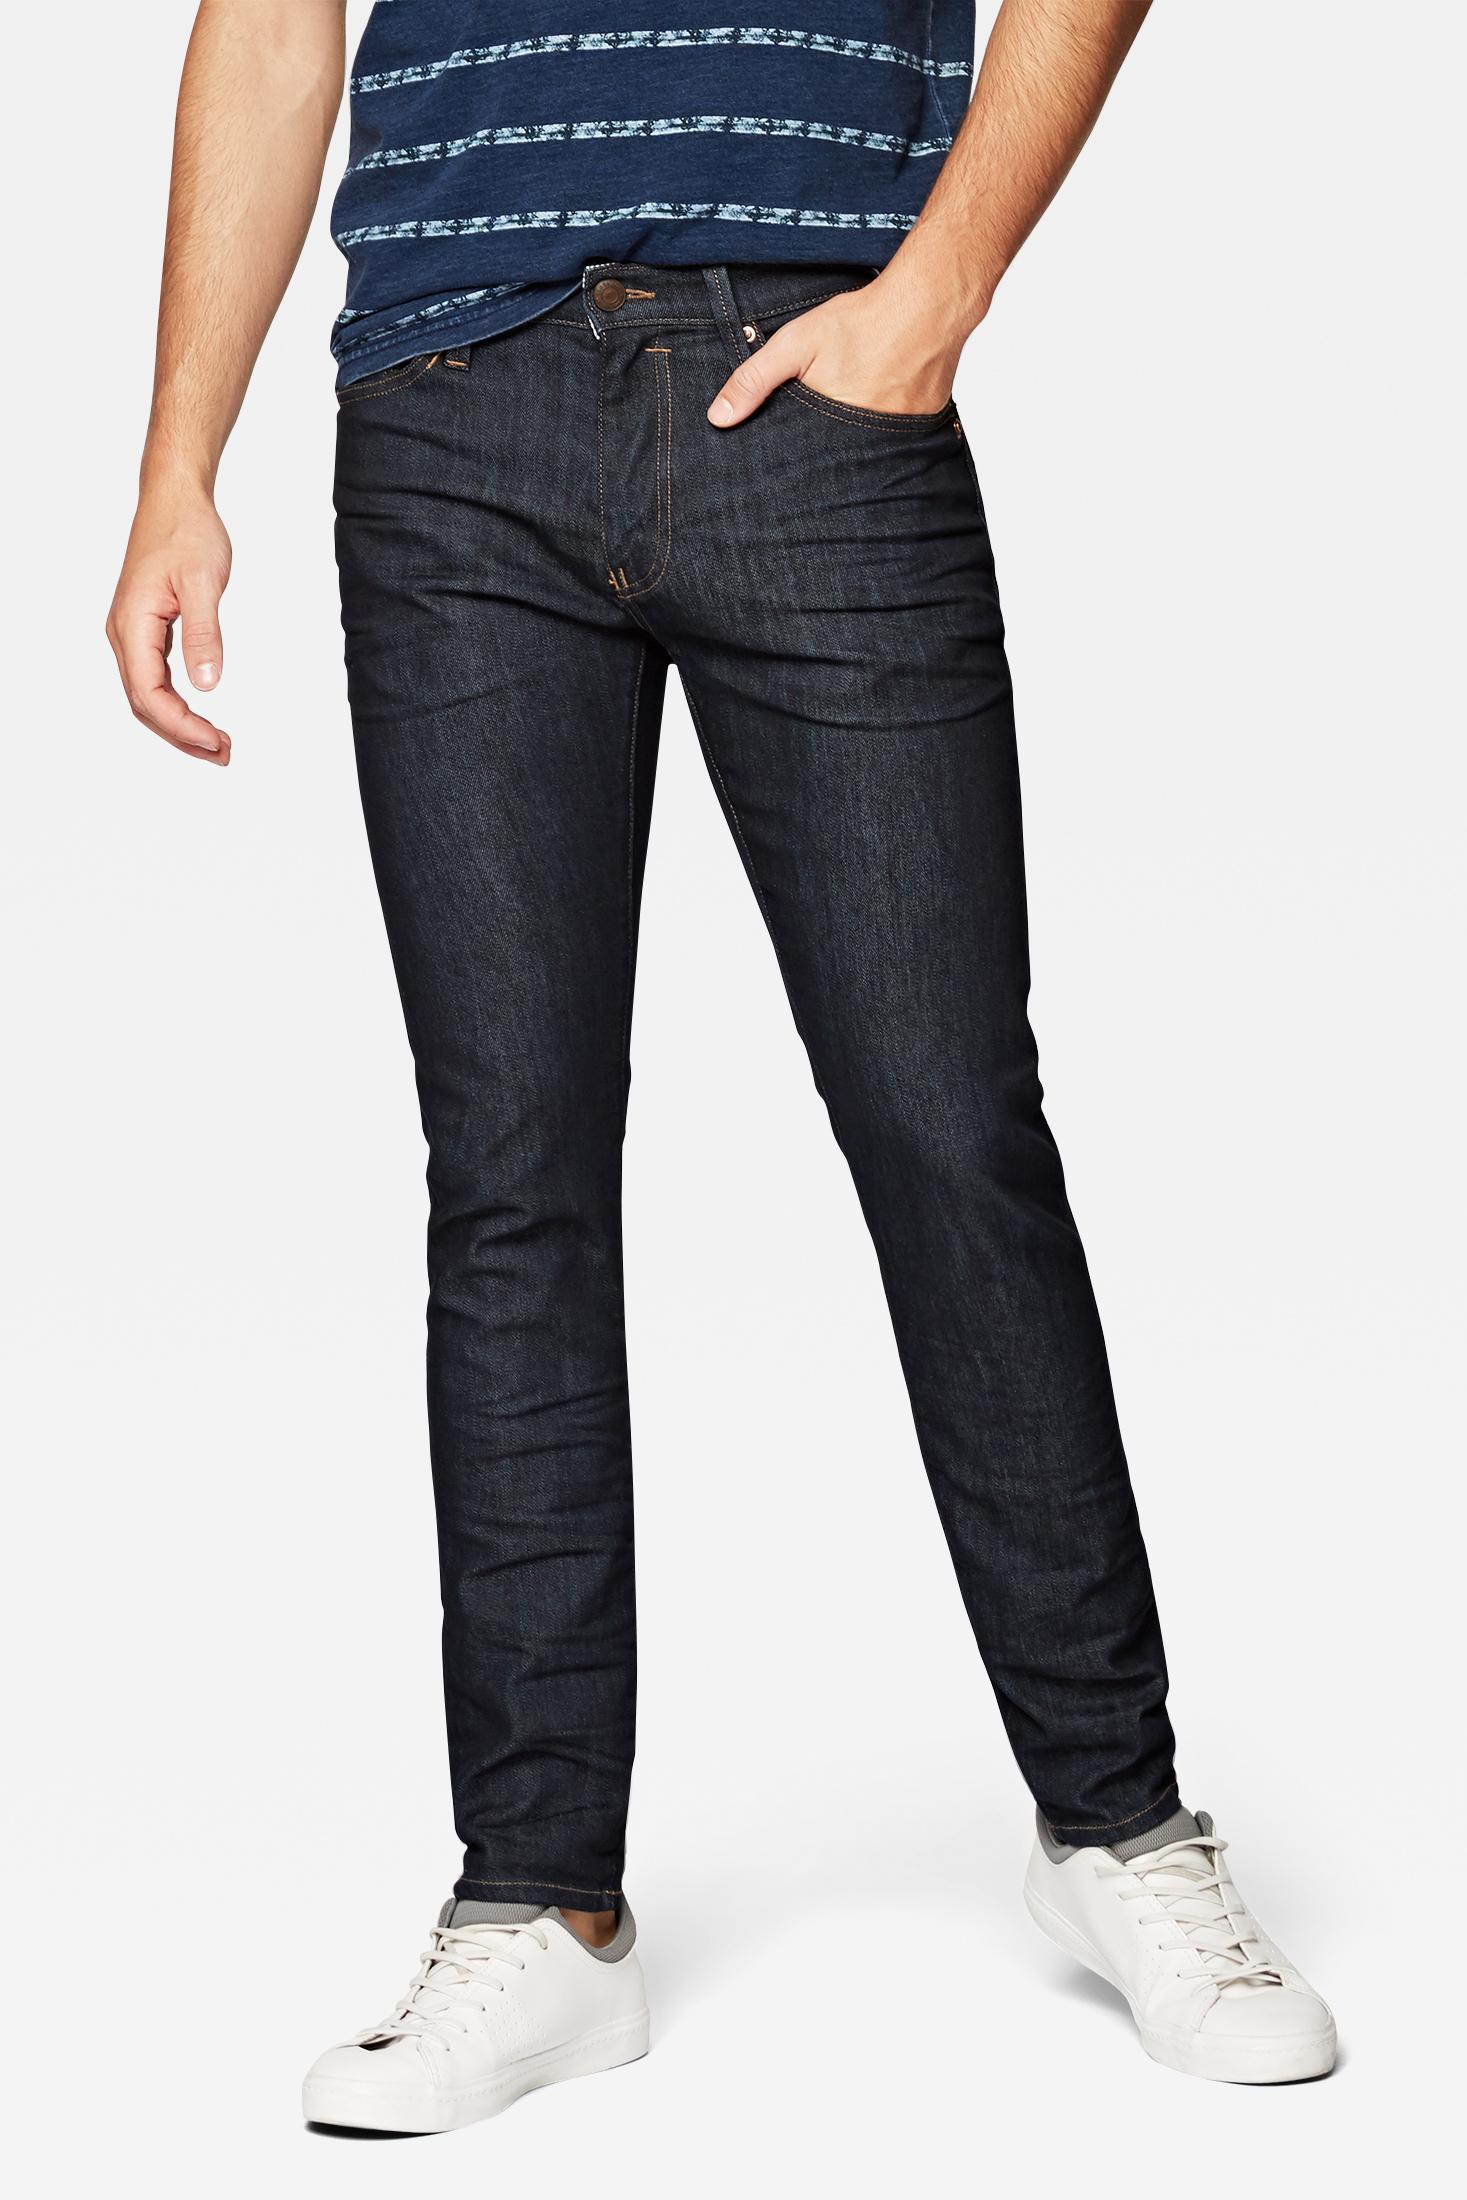 Mavi James Skinny Jeans in dunkelblau ohne verwaschung